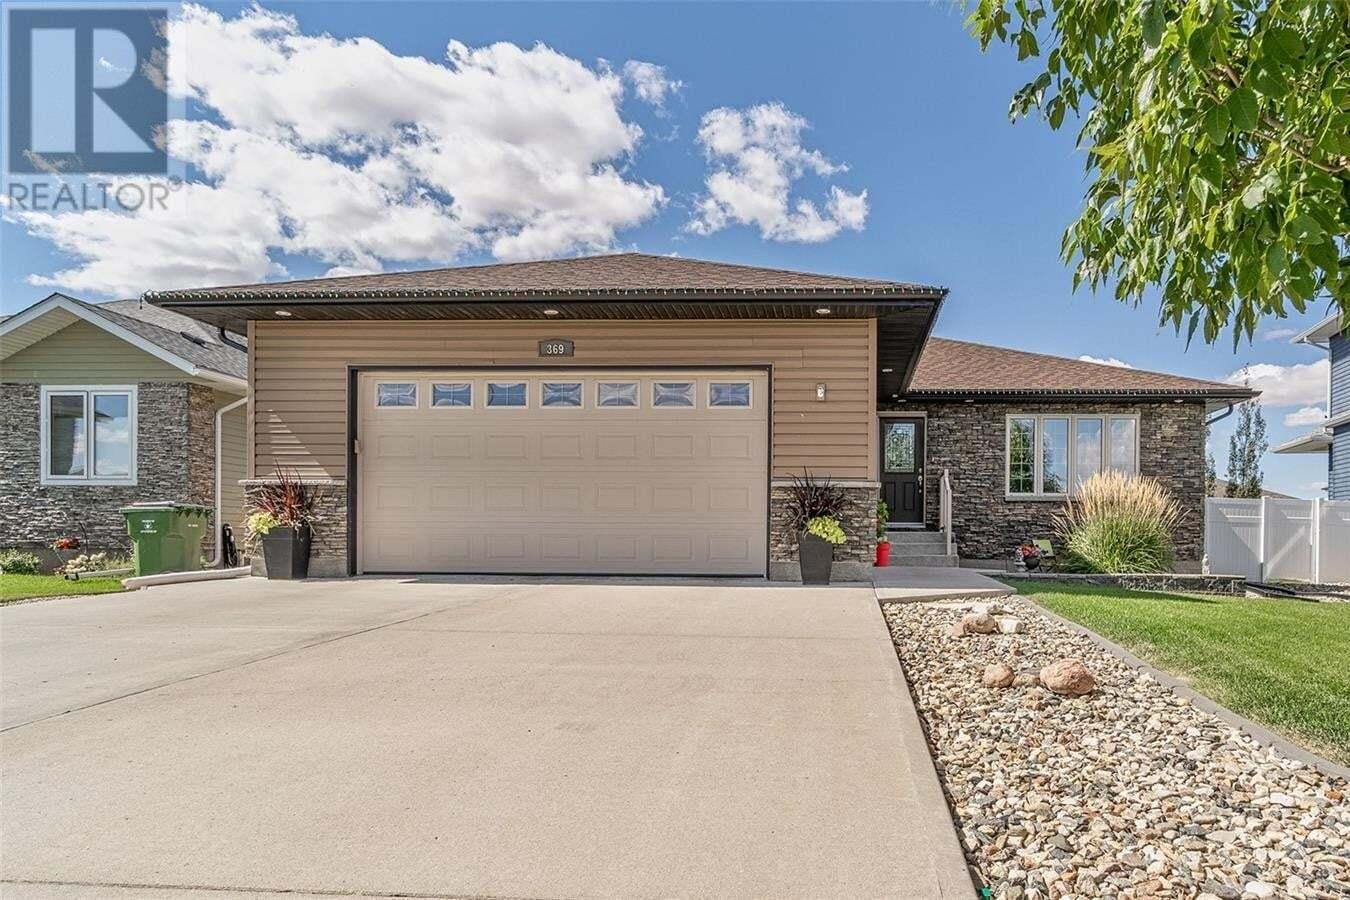 House for sale at 369 Wood Lily Dr Moose Jaw Saskatchewan - MLS: SK824350